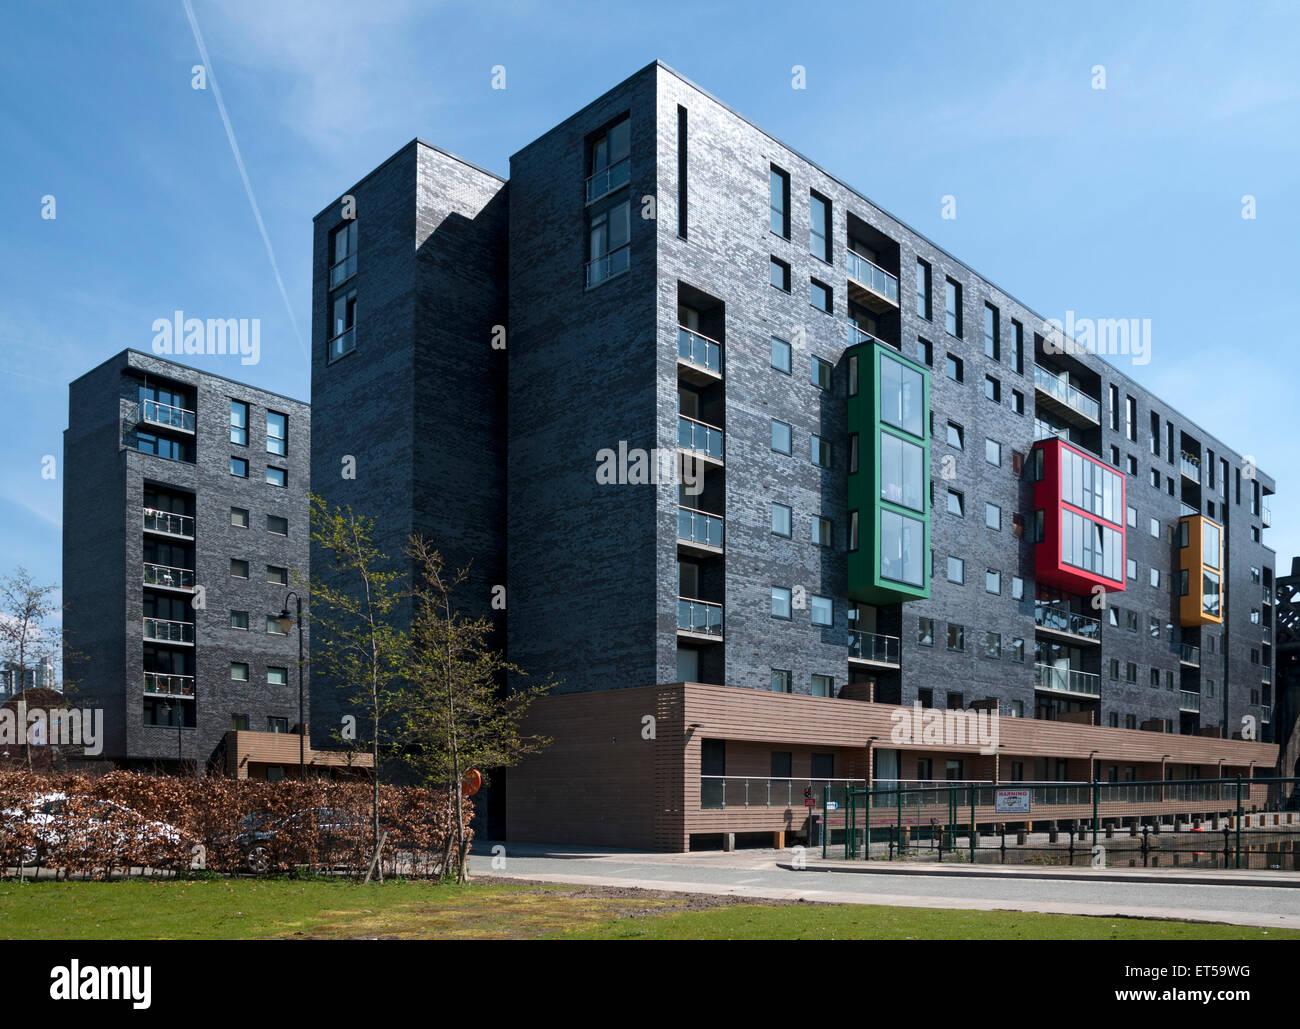 Apartments At Potato Wharf Castlefield Manchester England Uk